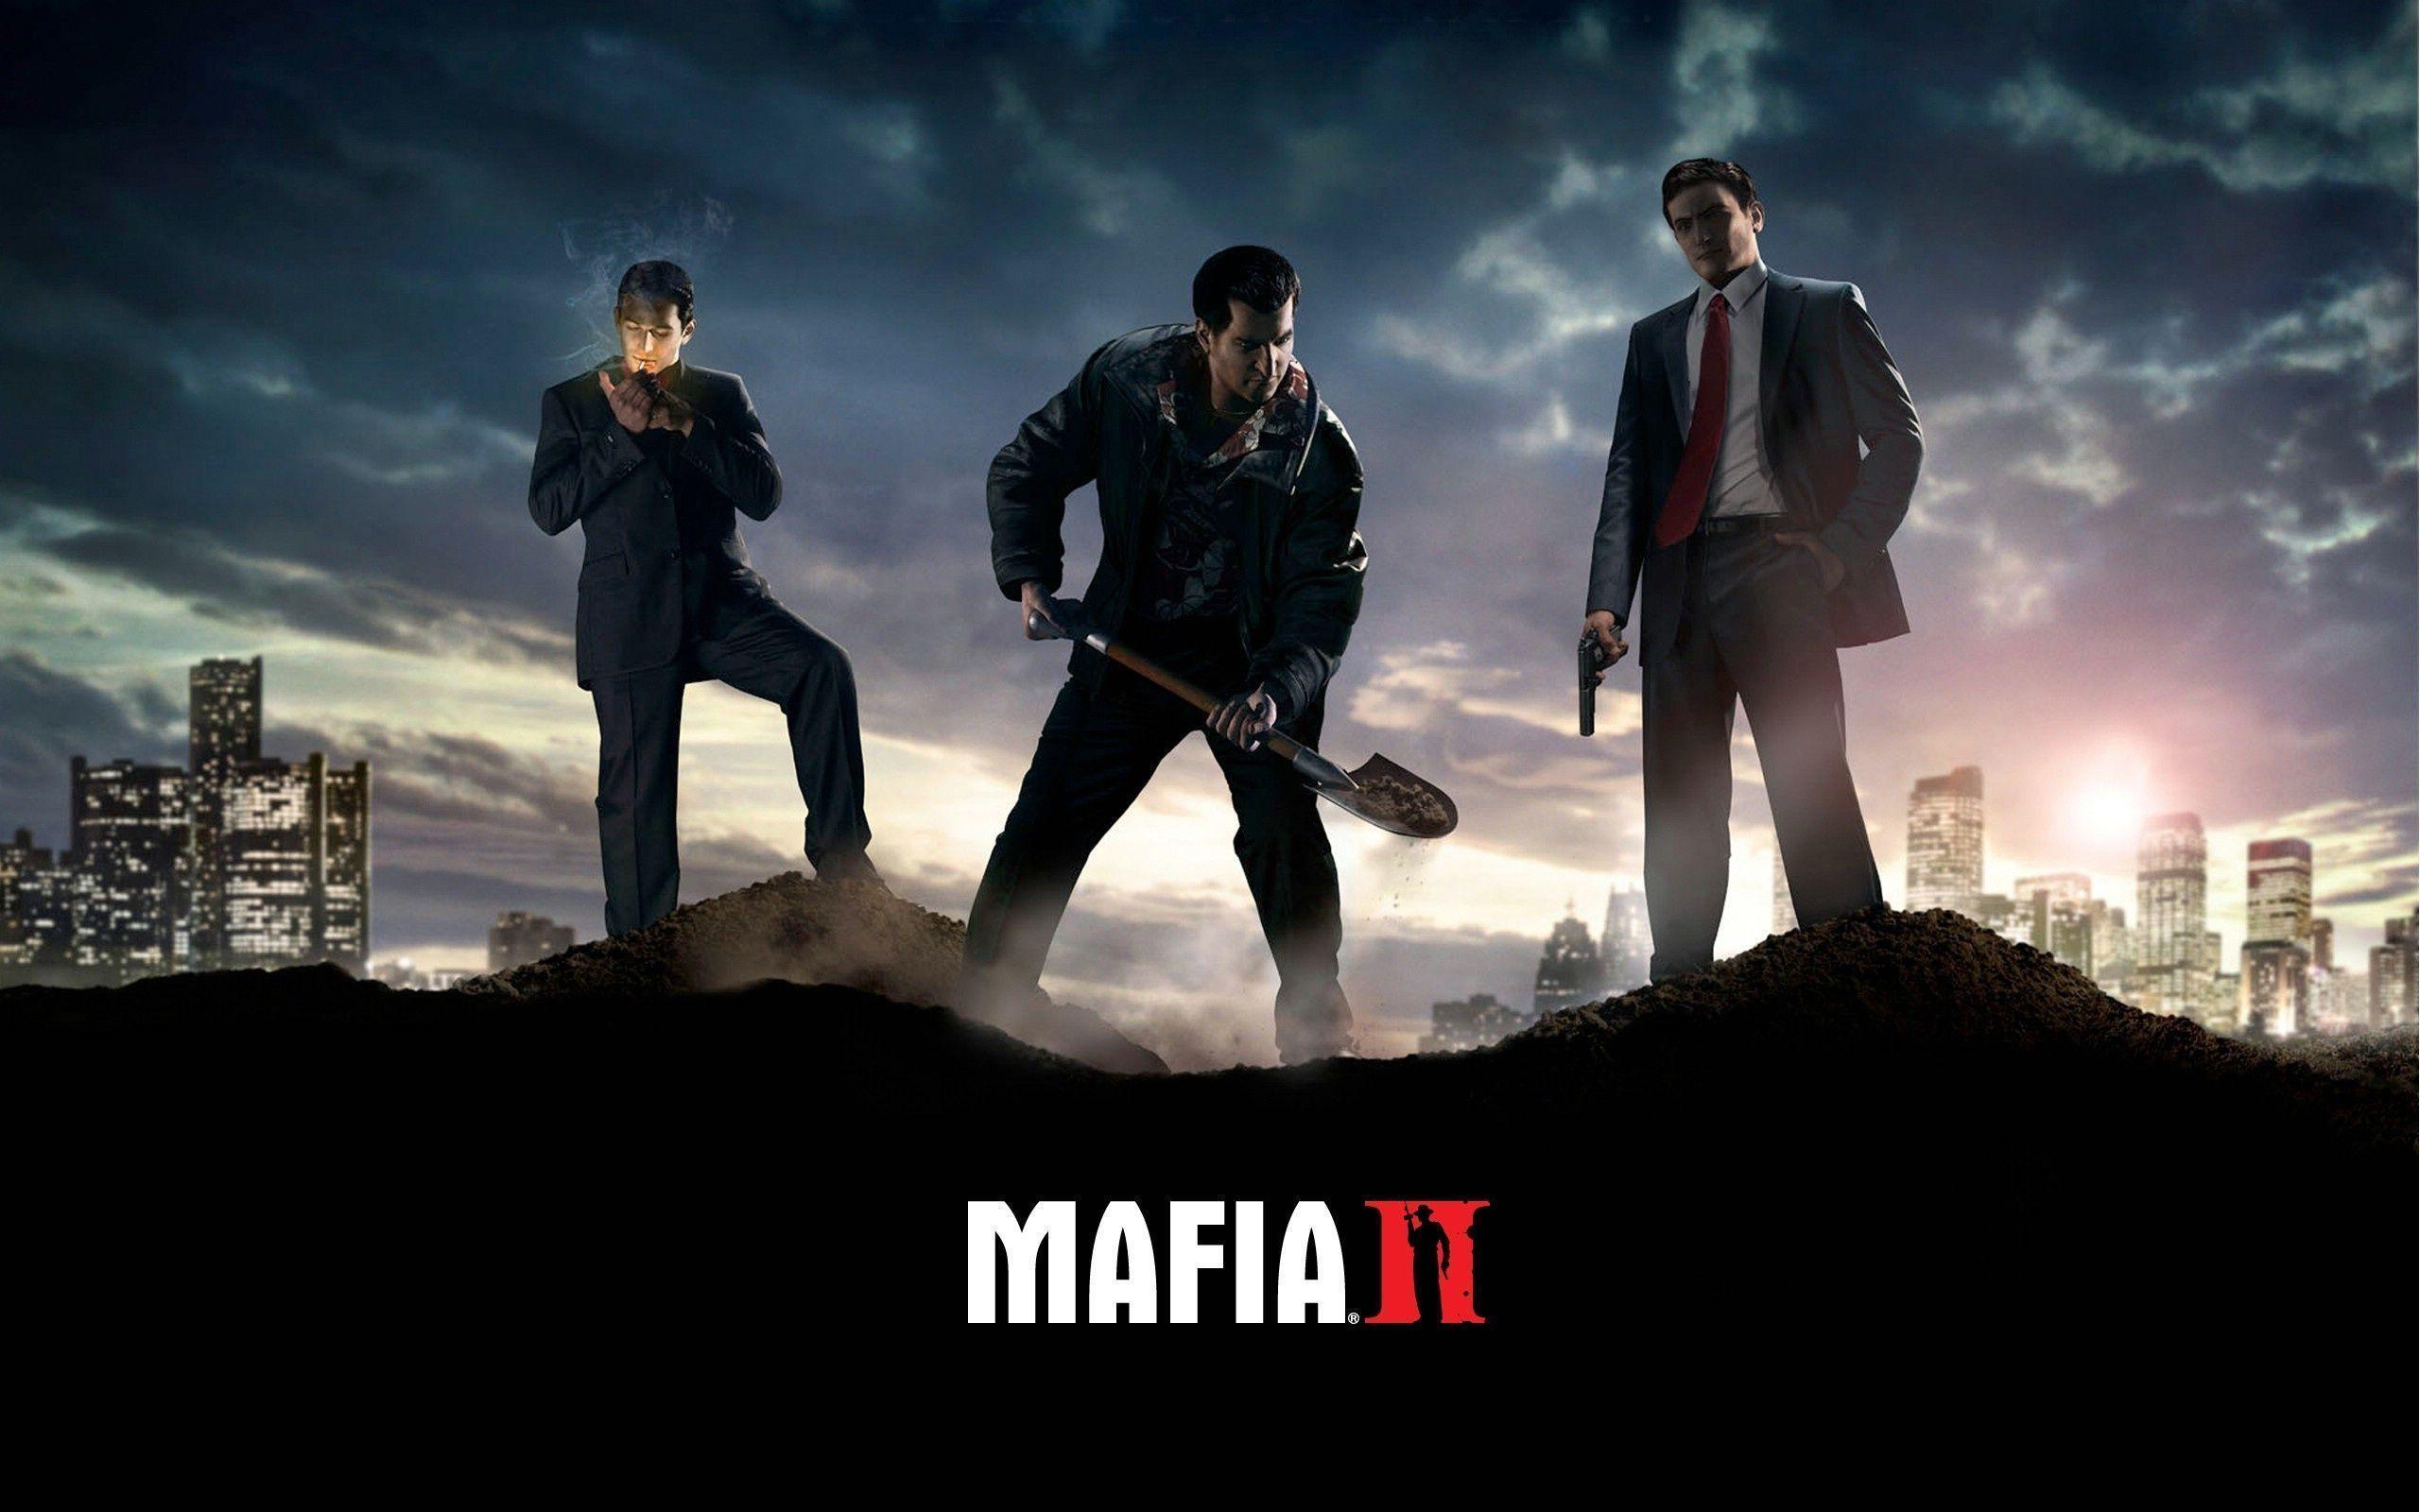 Download Mafia 2 Wallpaper HD (8996) Full Size | Free Game .